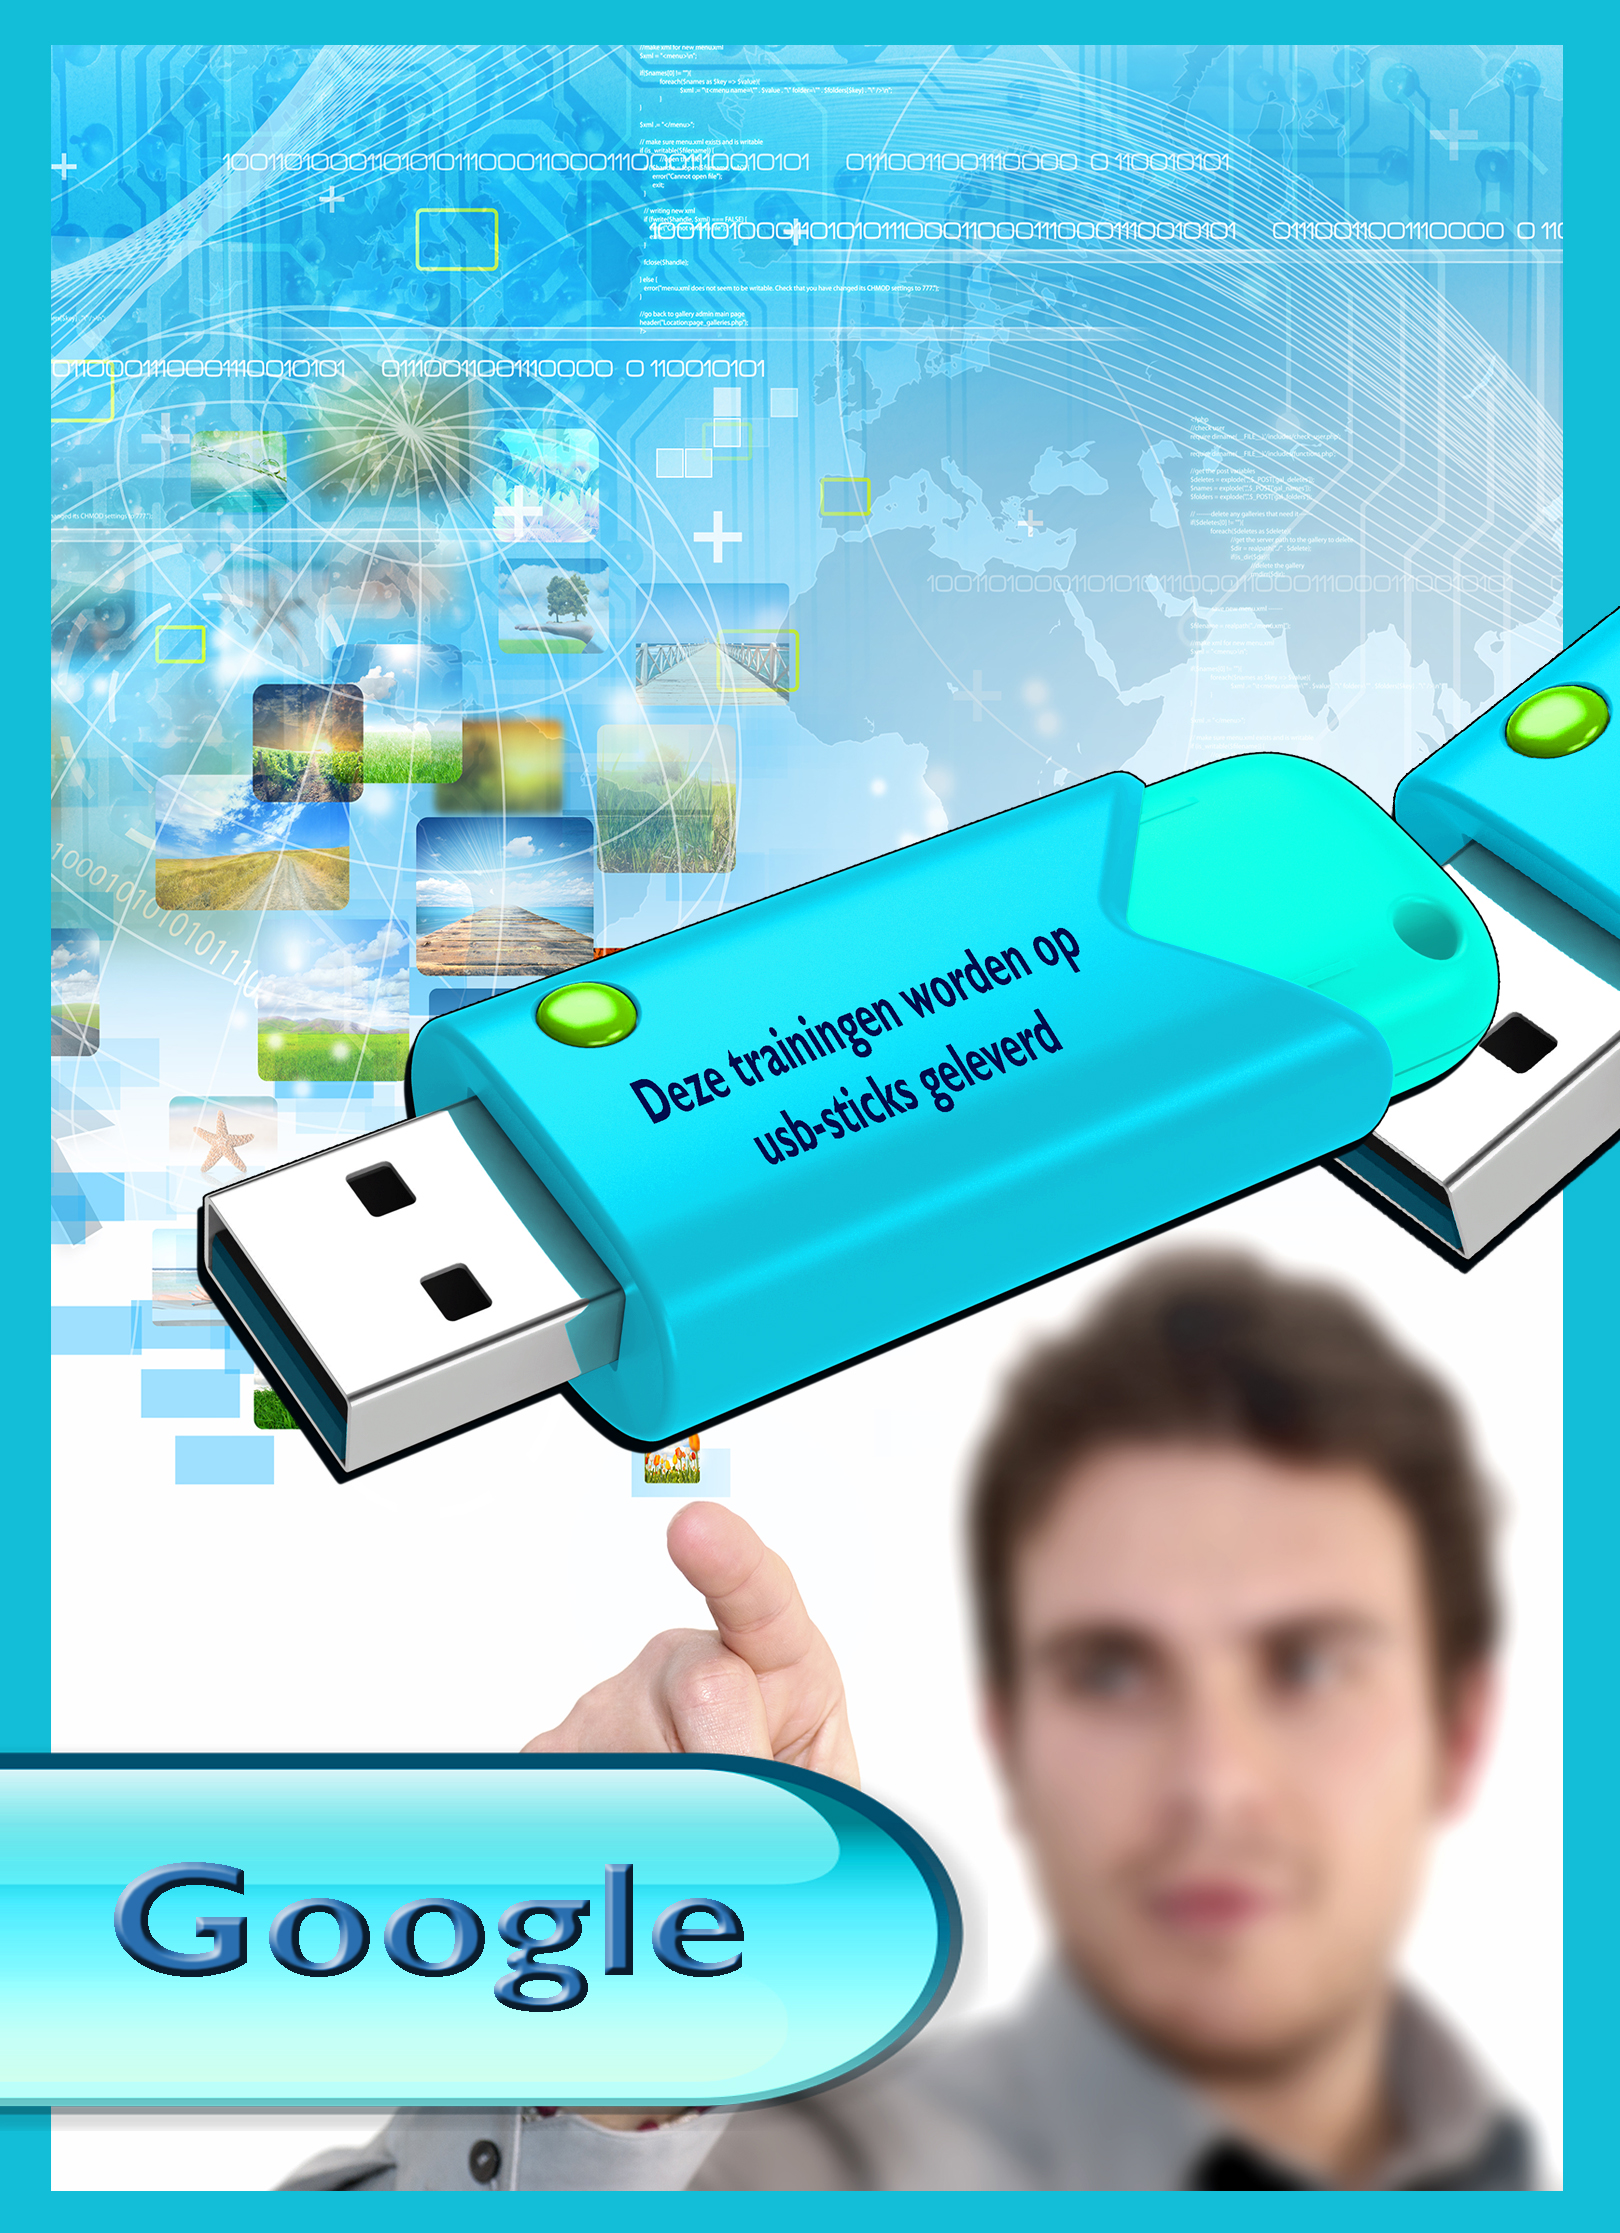 DVD hoesjeGoogle